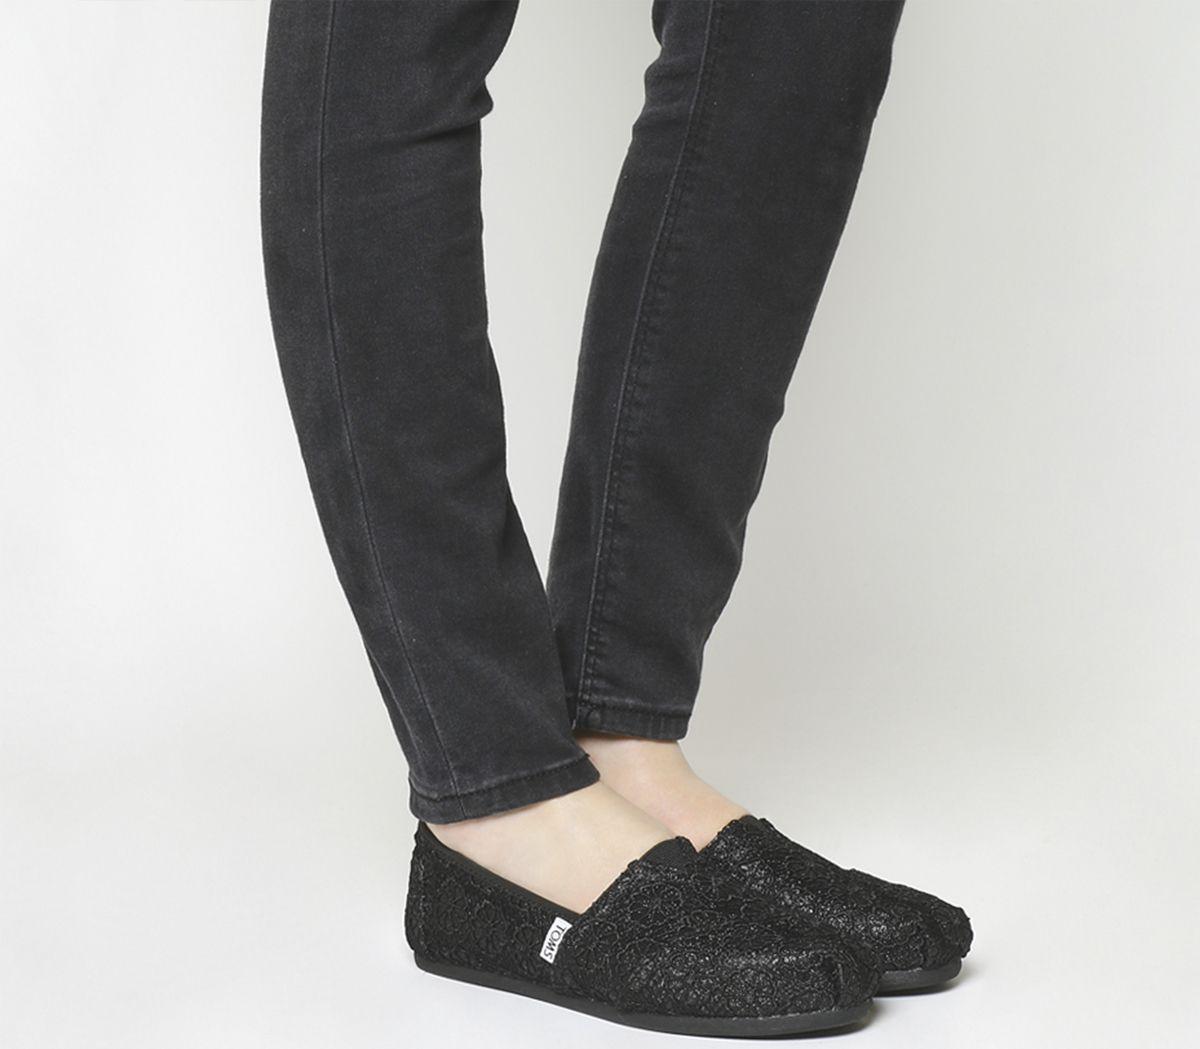 Toms Seasonal Classic Slip Ons Black Crochet Glitter Flats